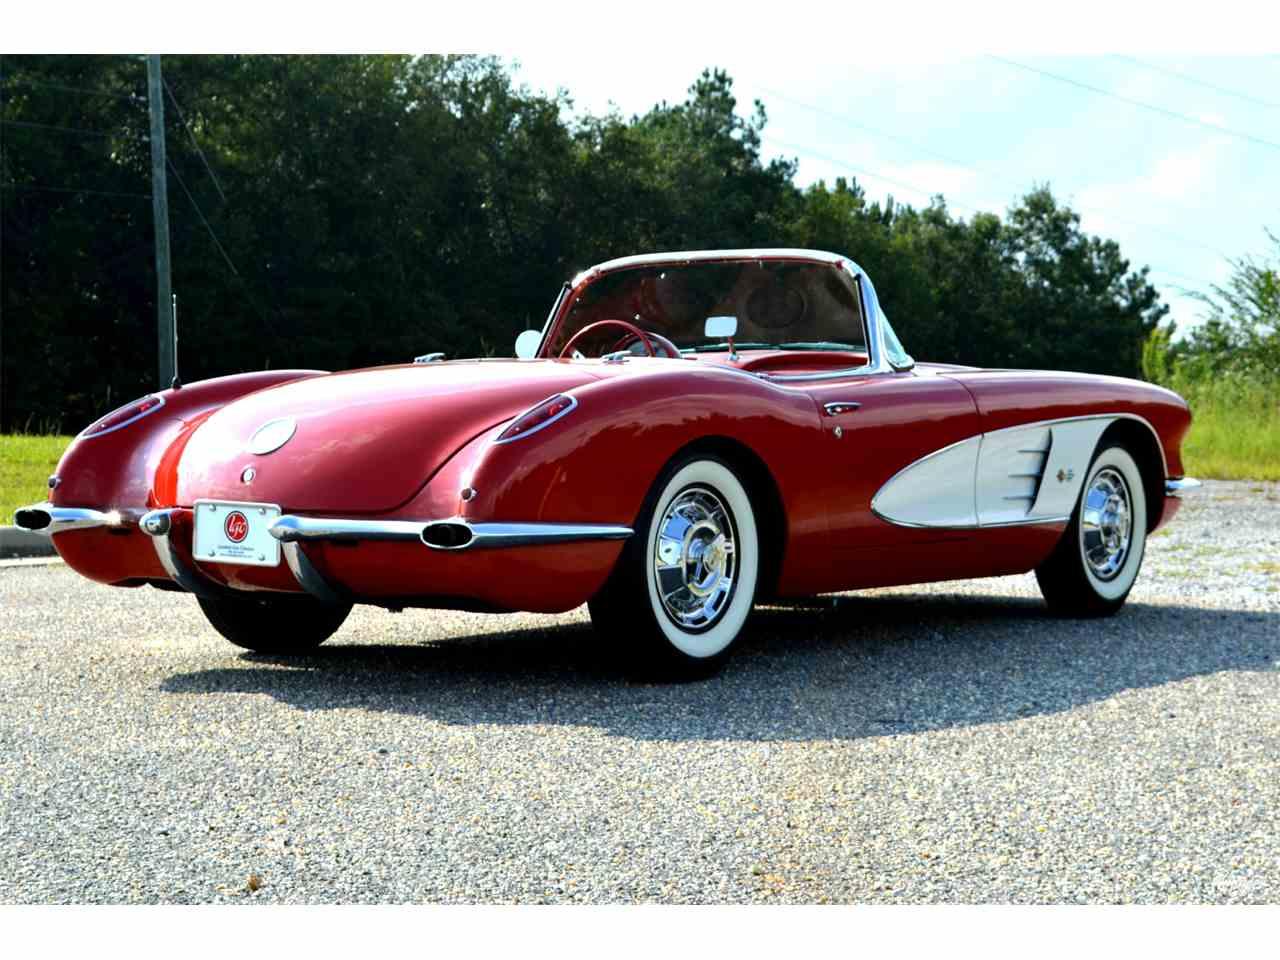 1959 chevrolet corvette for sale cc 1022286. Black Bedroom Furniture Sets. Home Design Ideas